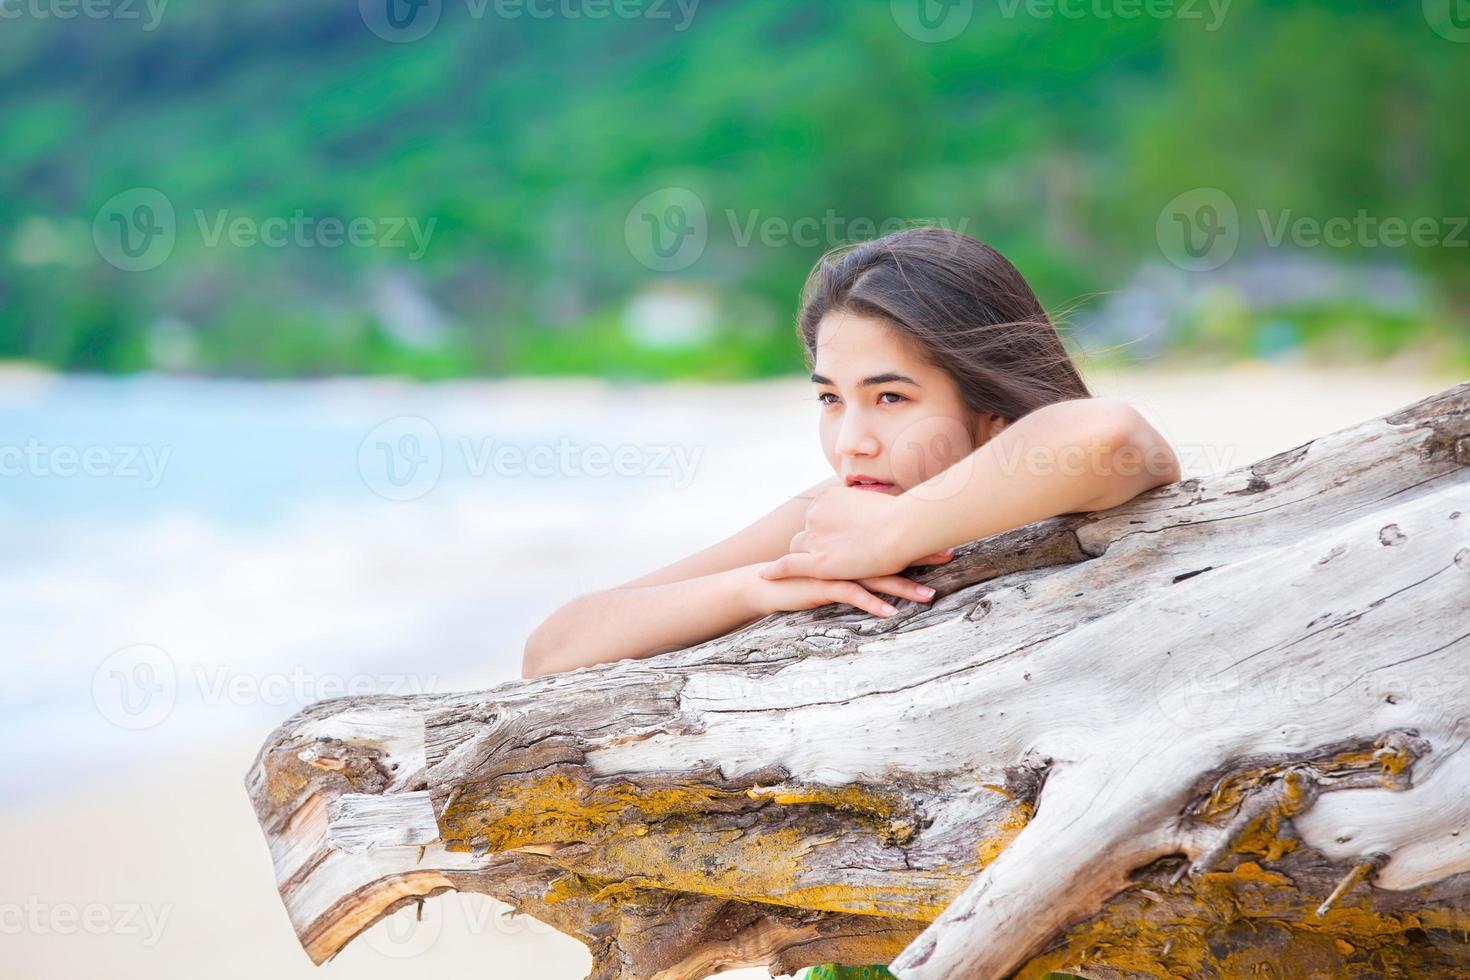 Beautiful teen girl on beach praying by driftwood log photo